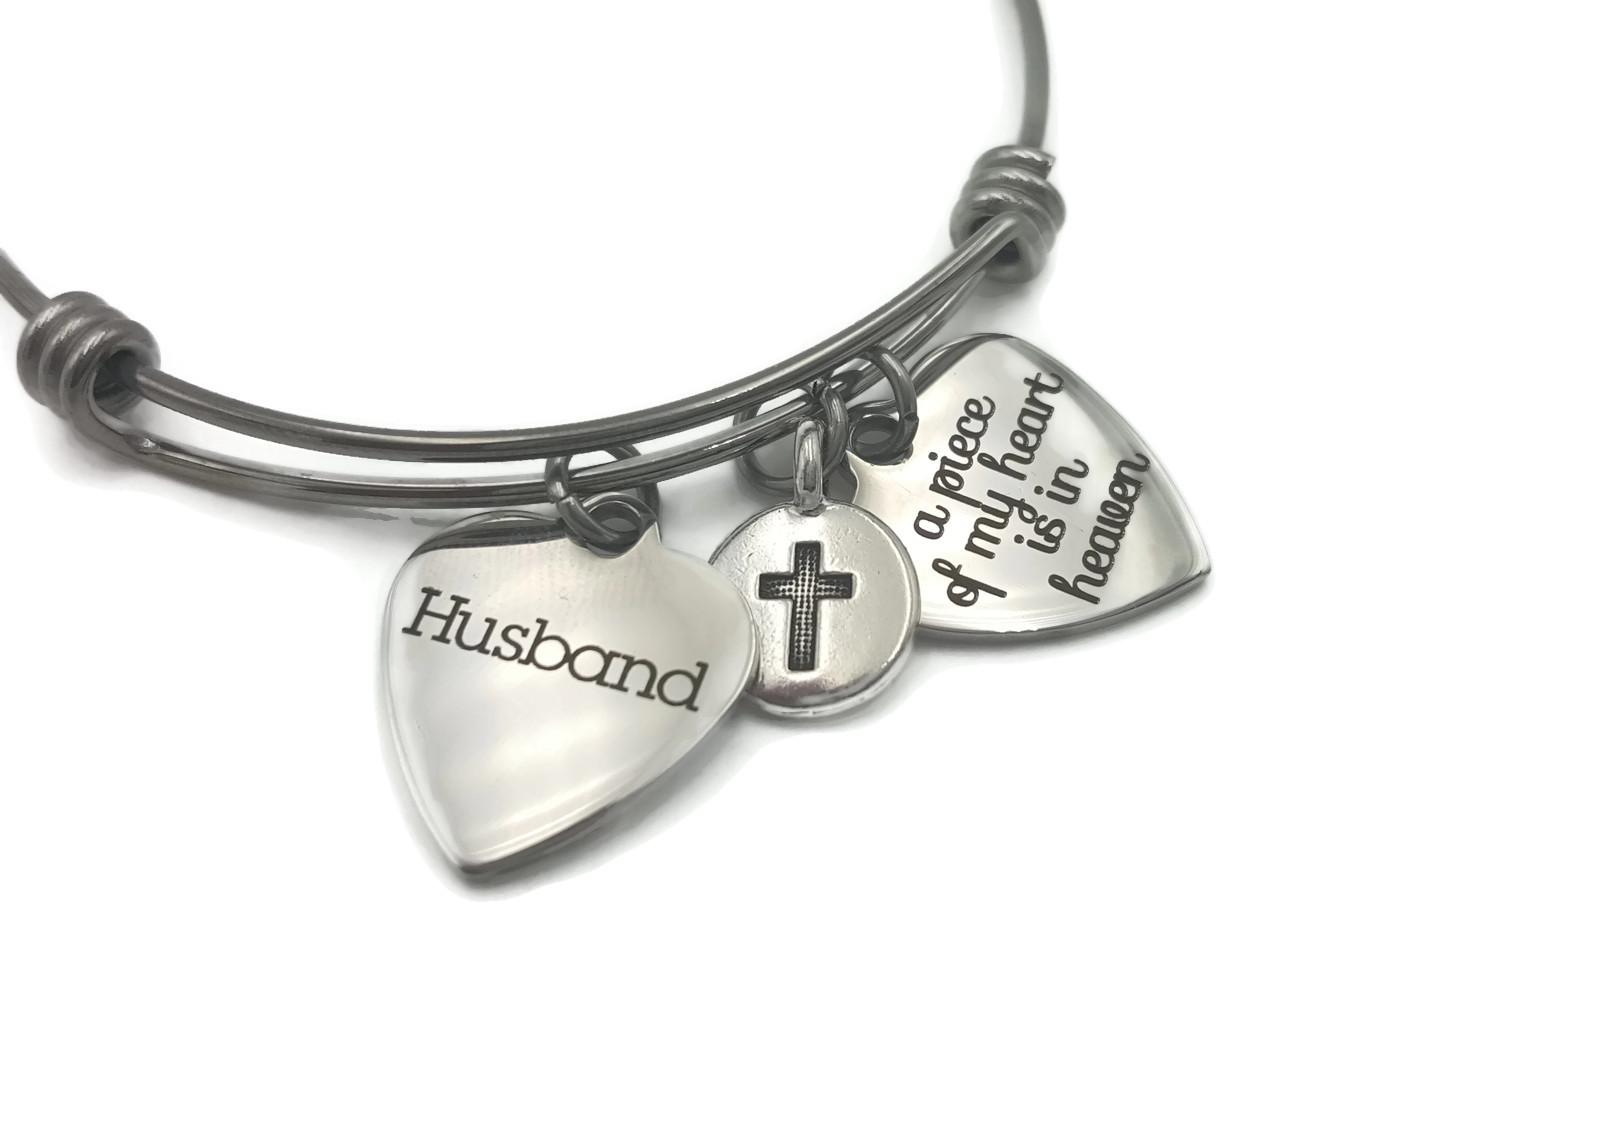 Memorial Gift for Loss of Husband - Remembrance Bracelet